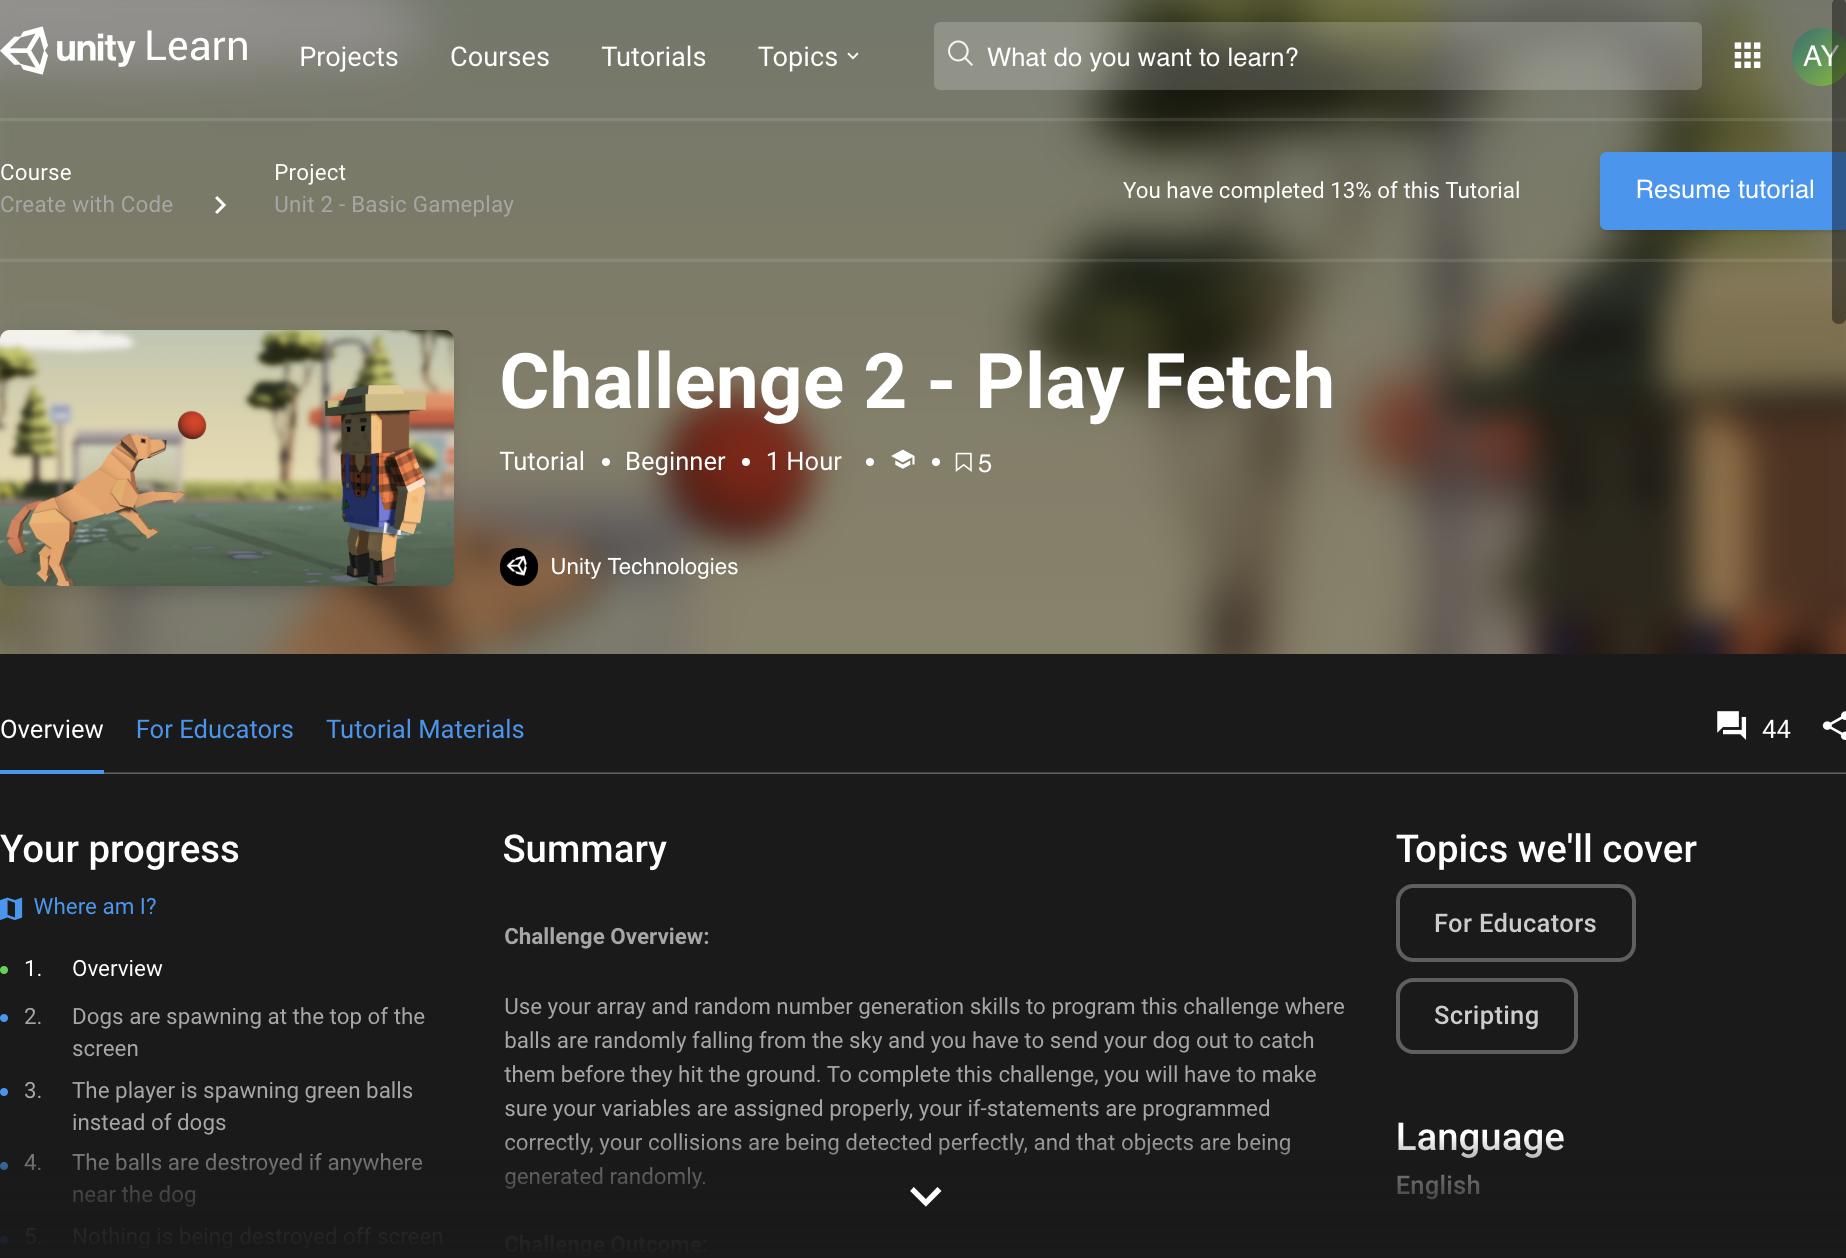 Alvin Yee - Challenge 2